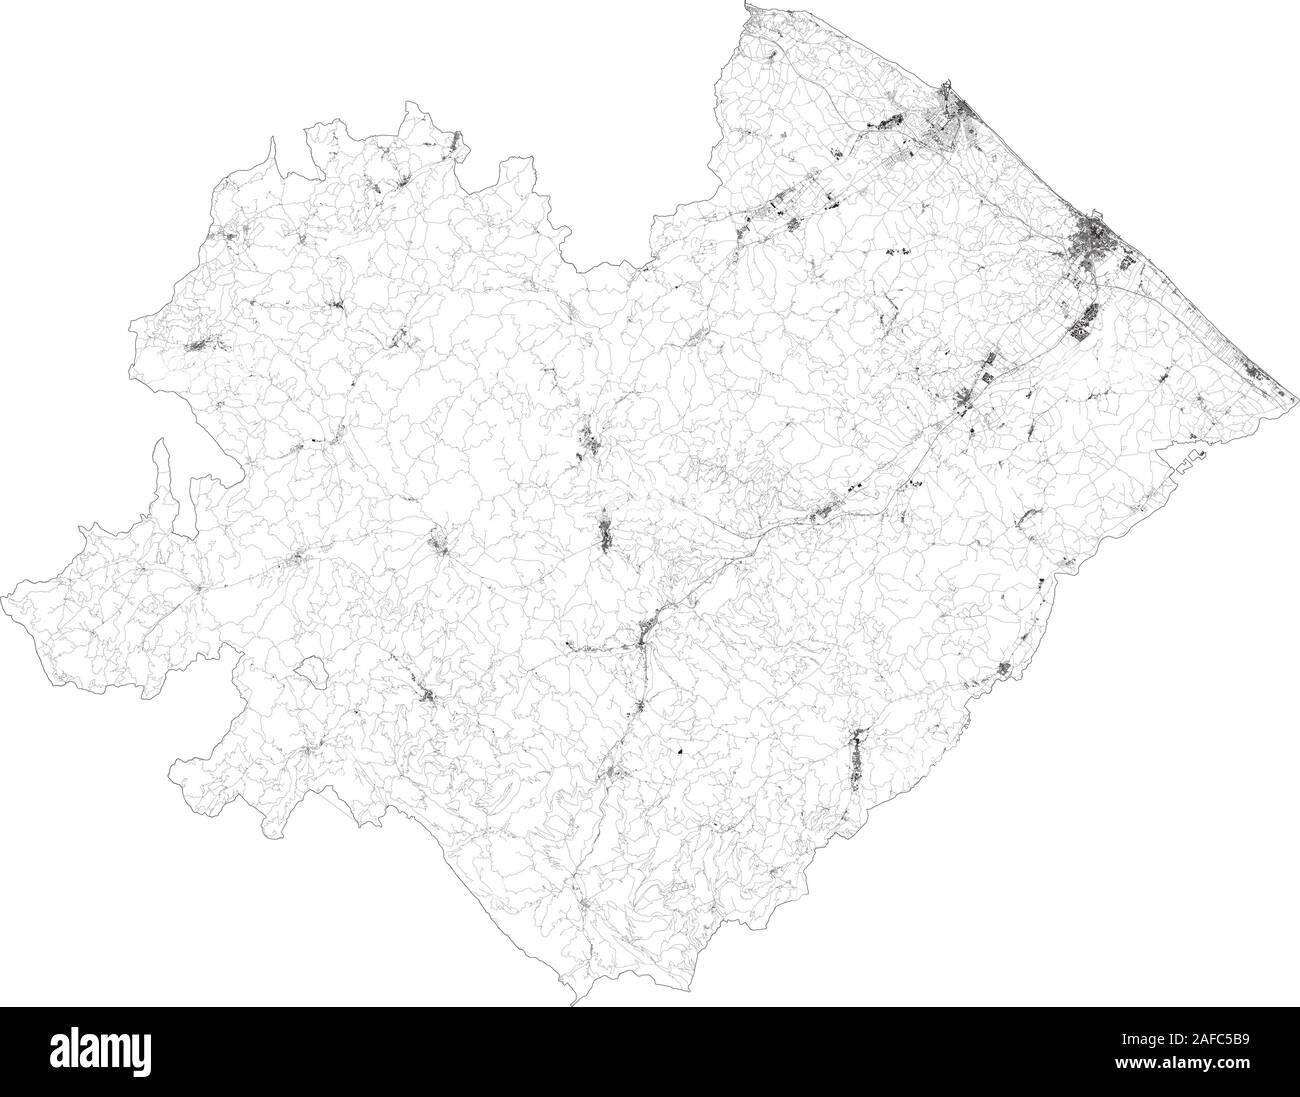 Cartina Geografica Provincia Di Pesaro Urbino.Pesaro Urbino Immagini Vettoriali Stock Alamy